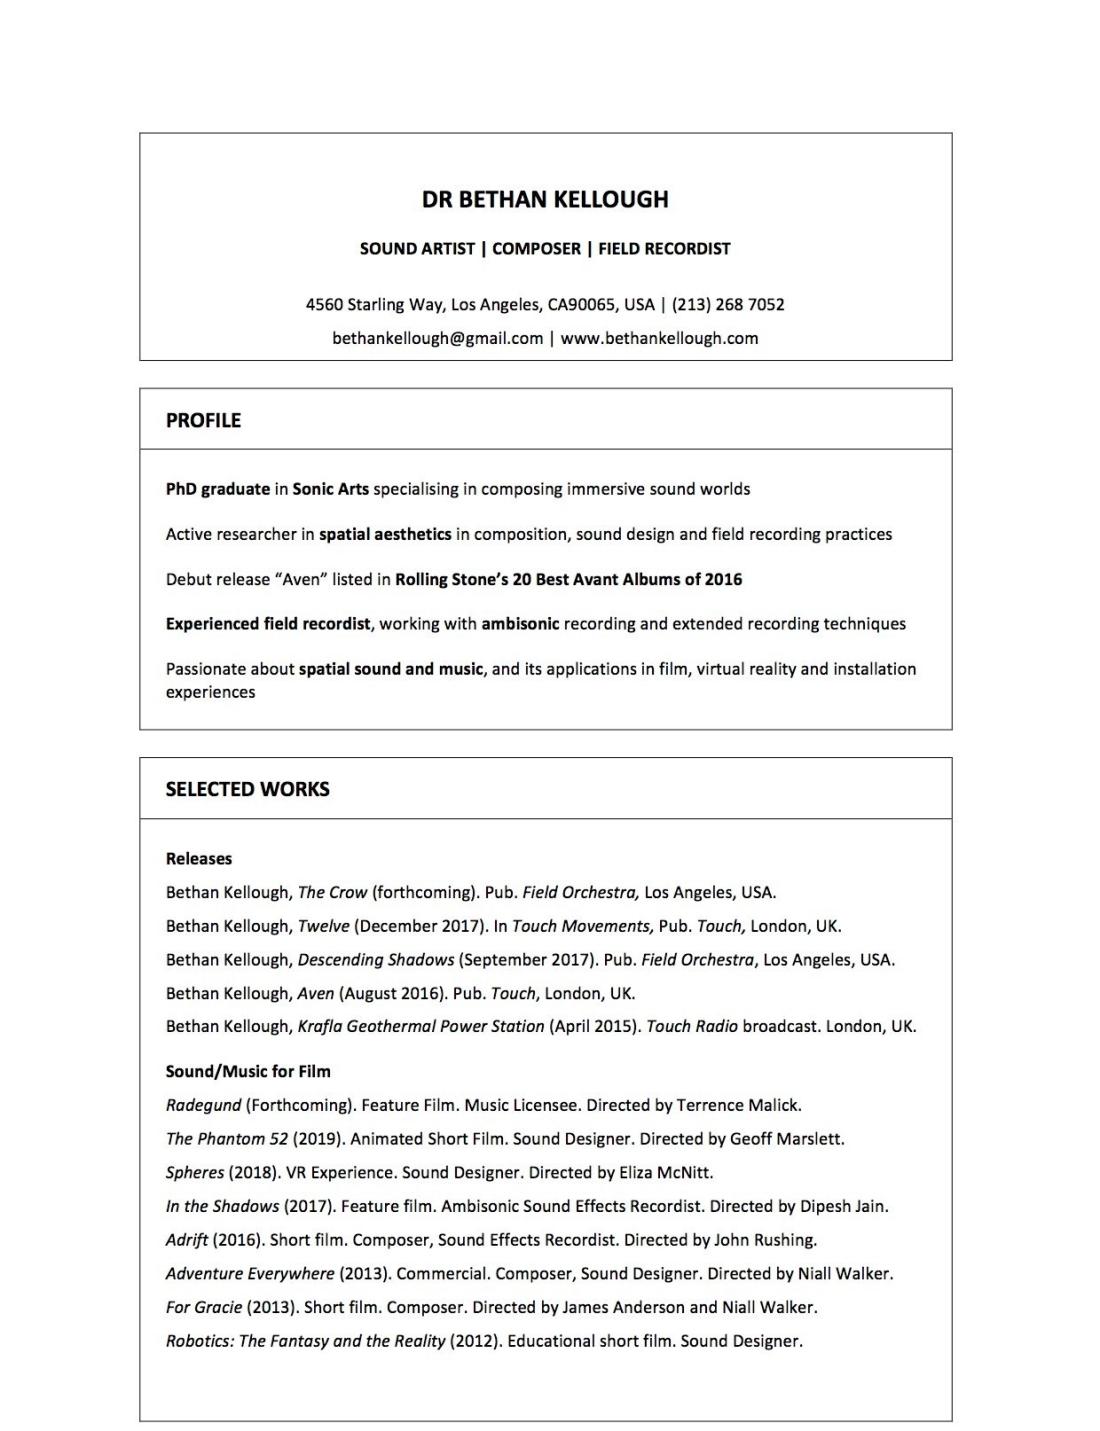 Curriculum Vitae Bethan Kellough